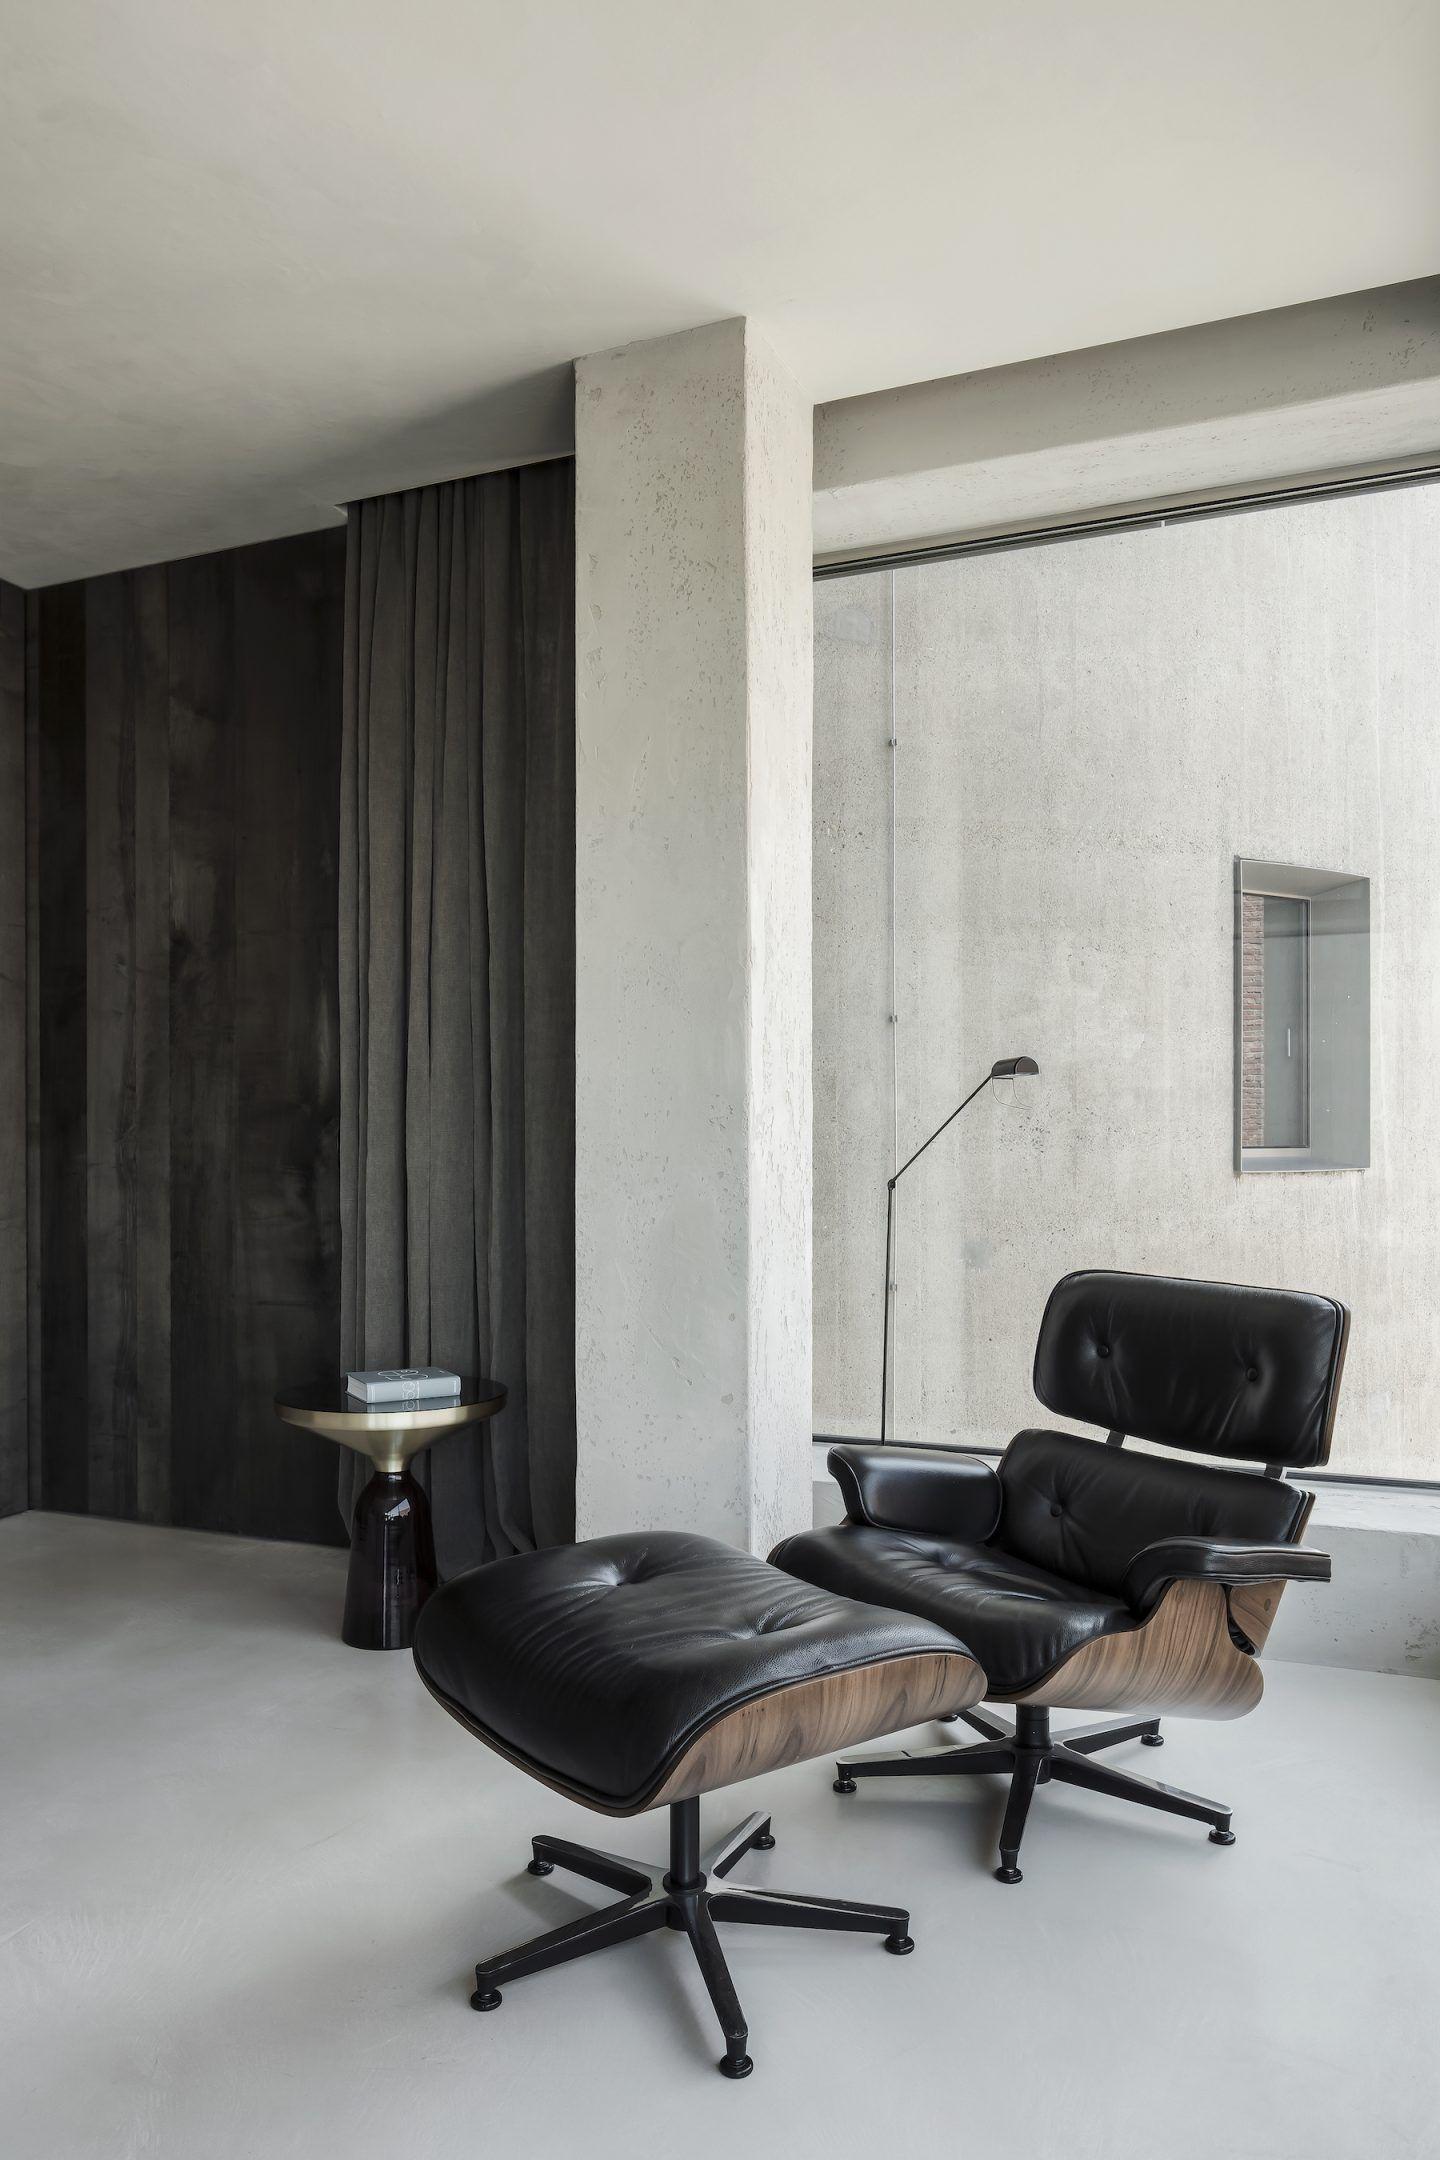 IGNANT-Architecture-Arjaan-De-Feyter-Silo-Apartment-02